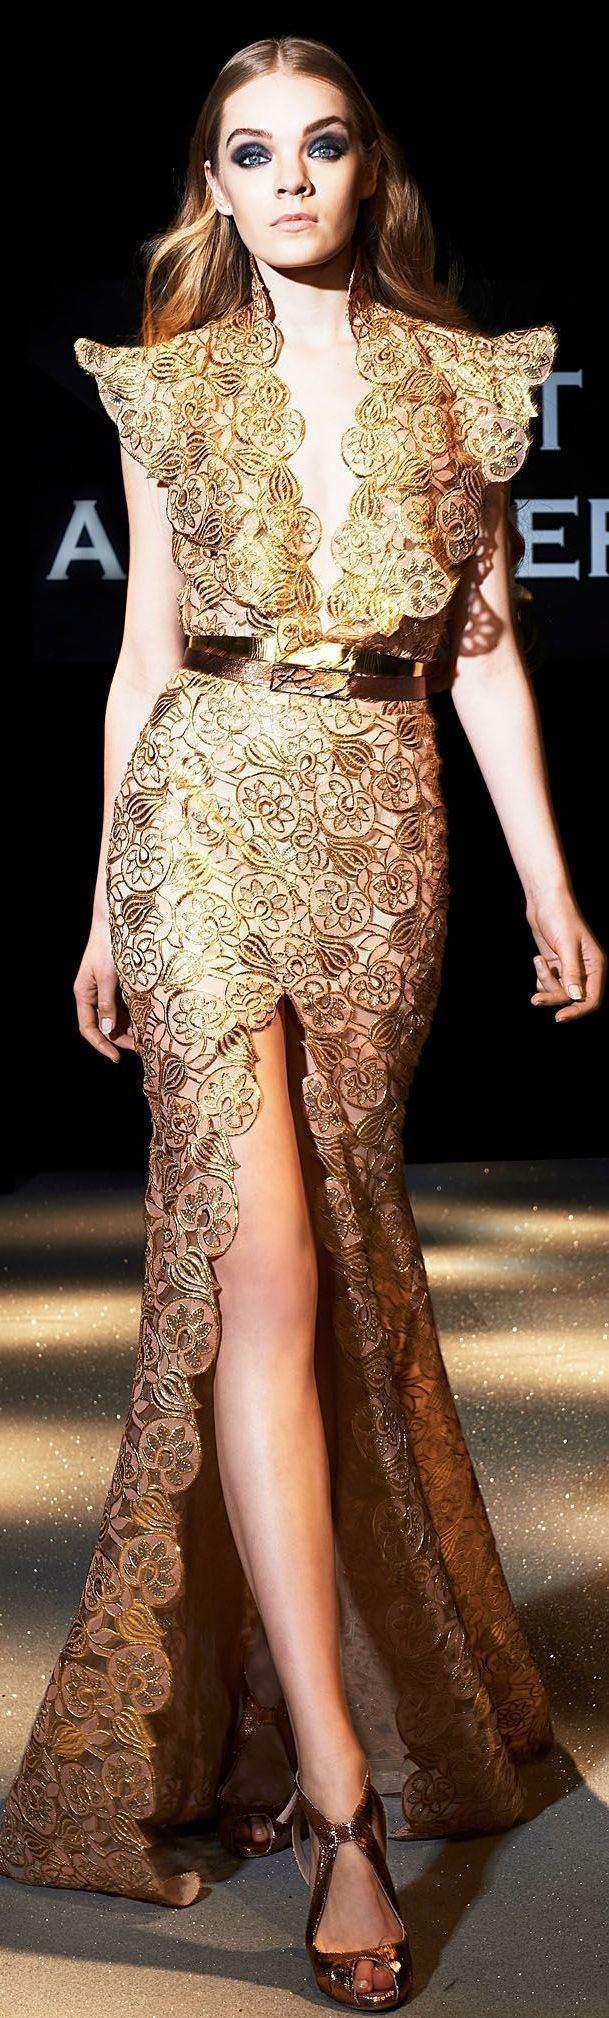 Robert Abi Nader 125 best Robert Abi Nader images on Pinterest Couture fashion